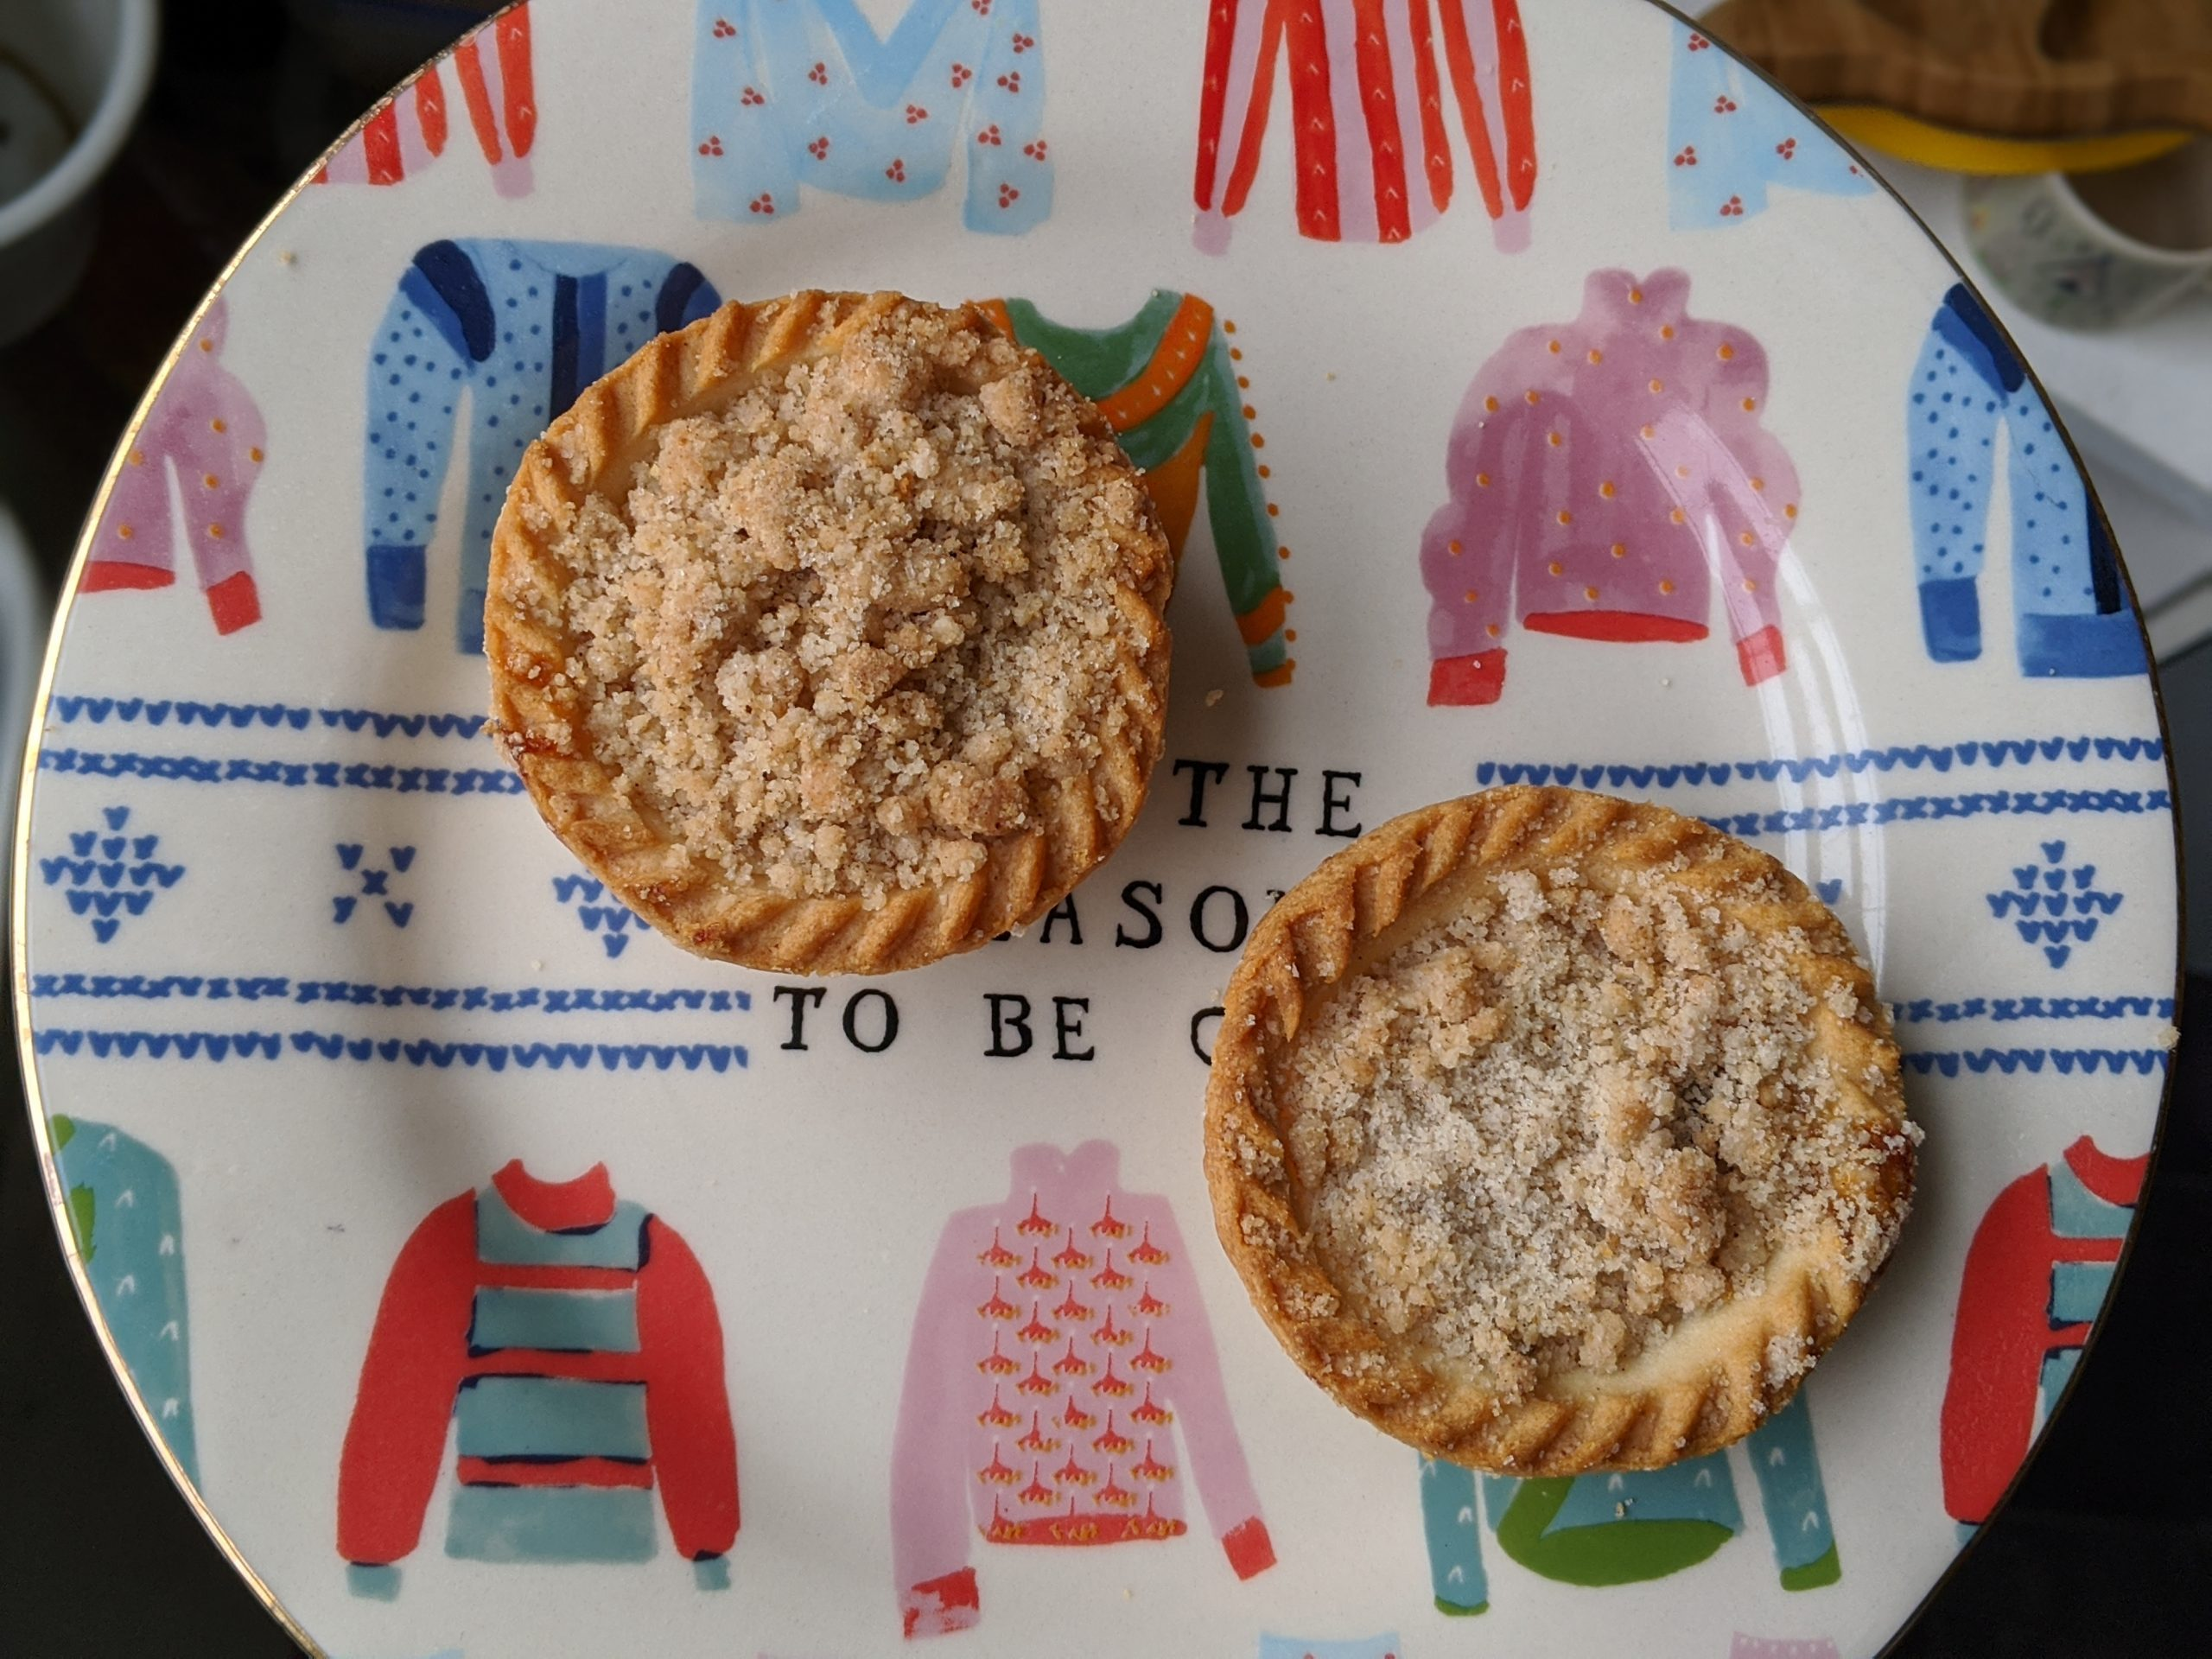 20 Gluten Free Mince Pies 2019 - Tesco Apple Crumble Gluten Free Mince Pies